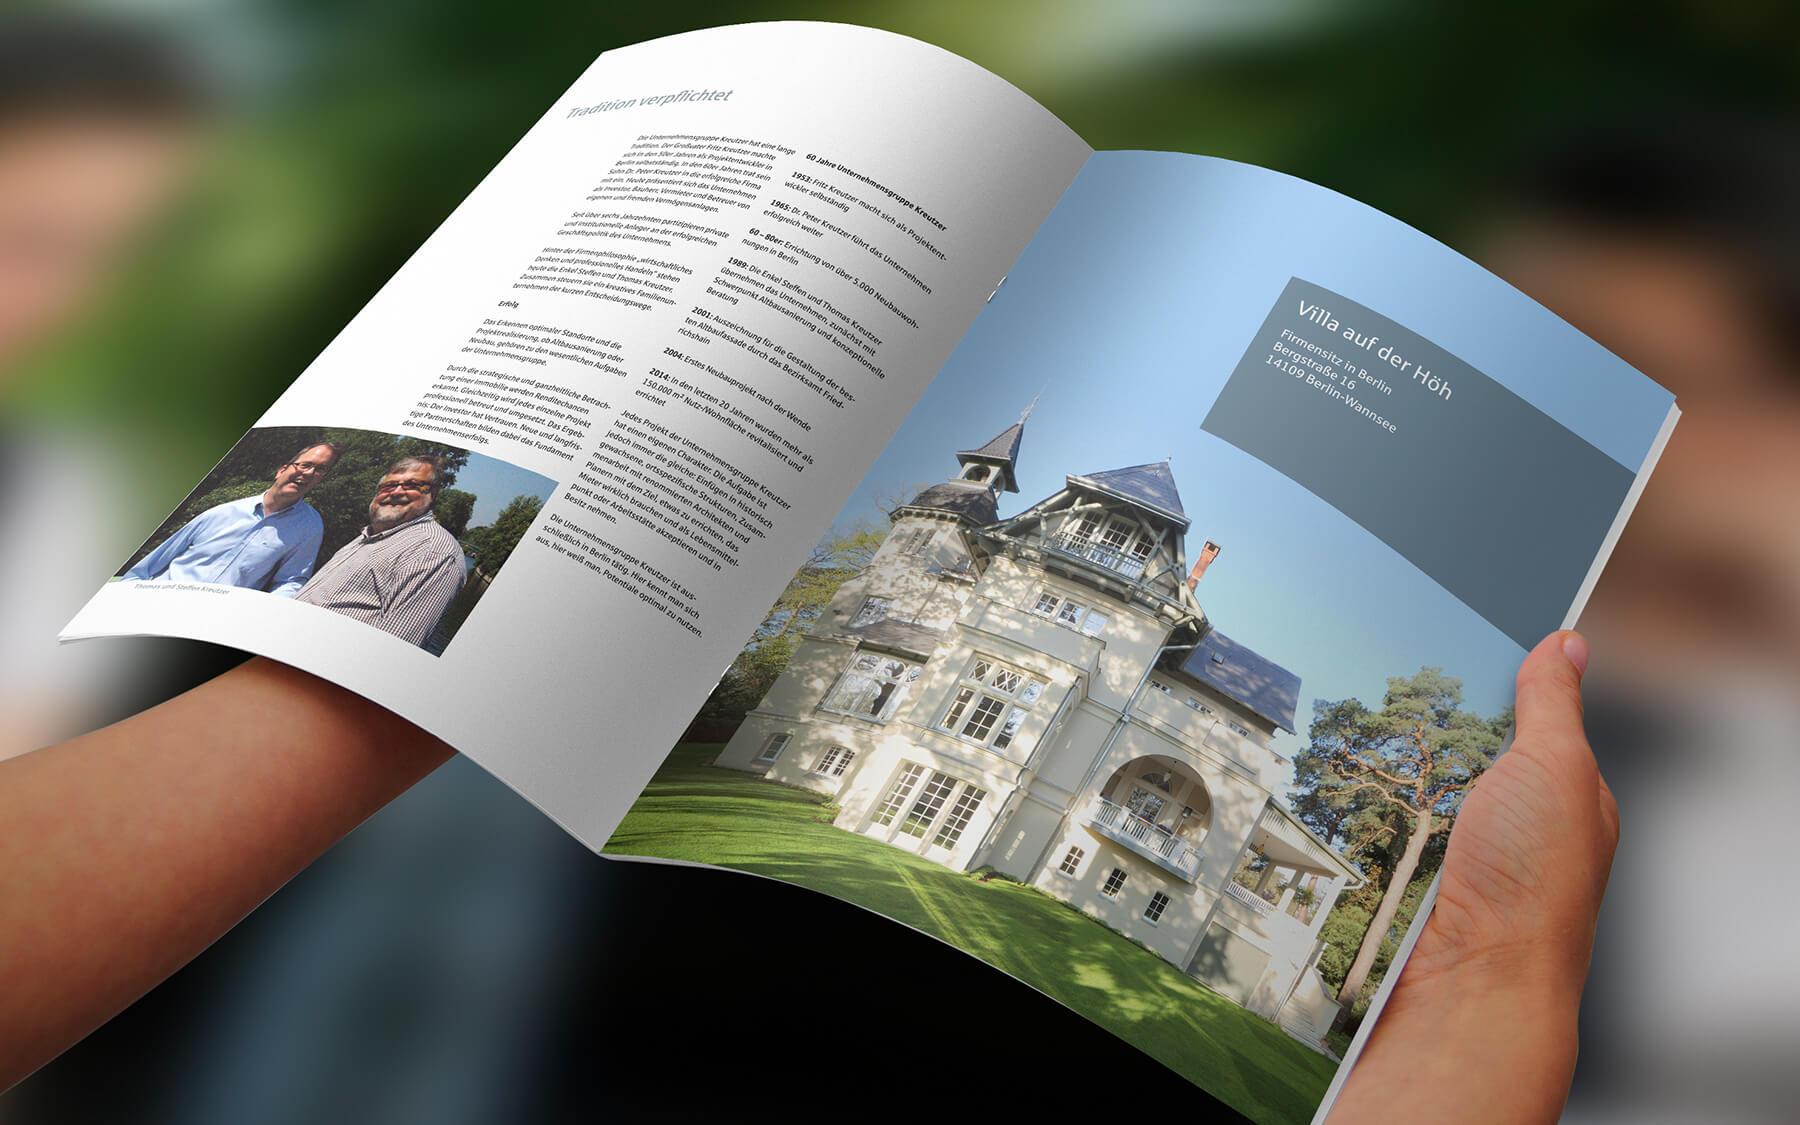 print agentur kataloge werbematerial layout stationery plakate kampagnen werbeagentur berlin corporate design